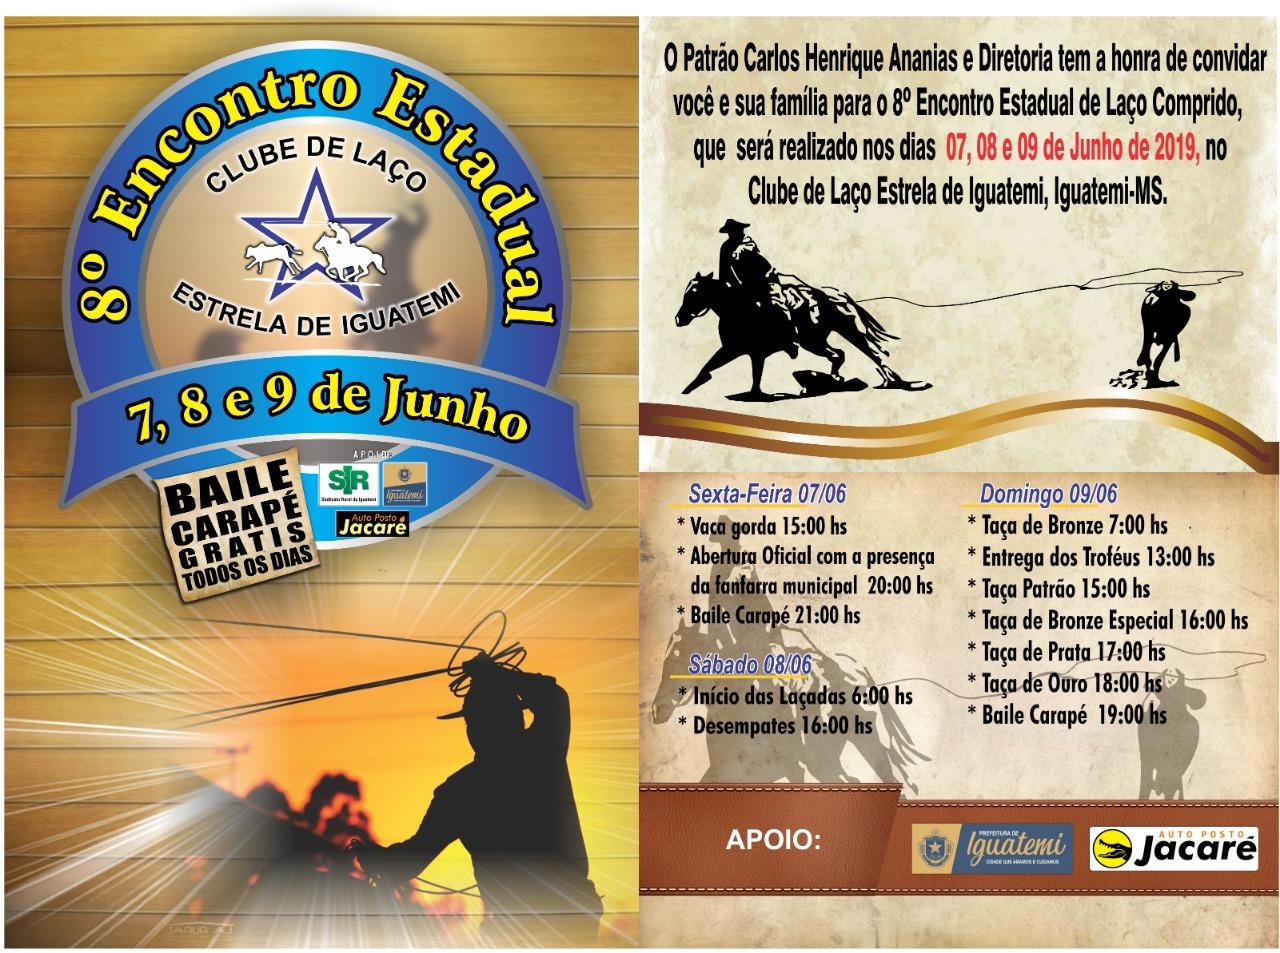 8º Encontro Estadual de Laço Comprido do Clube de Laço Estrela de Iguatemi